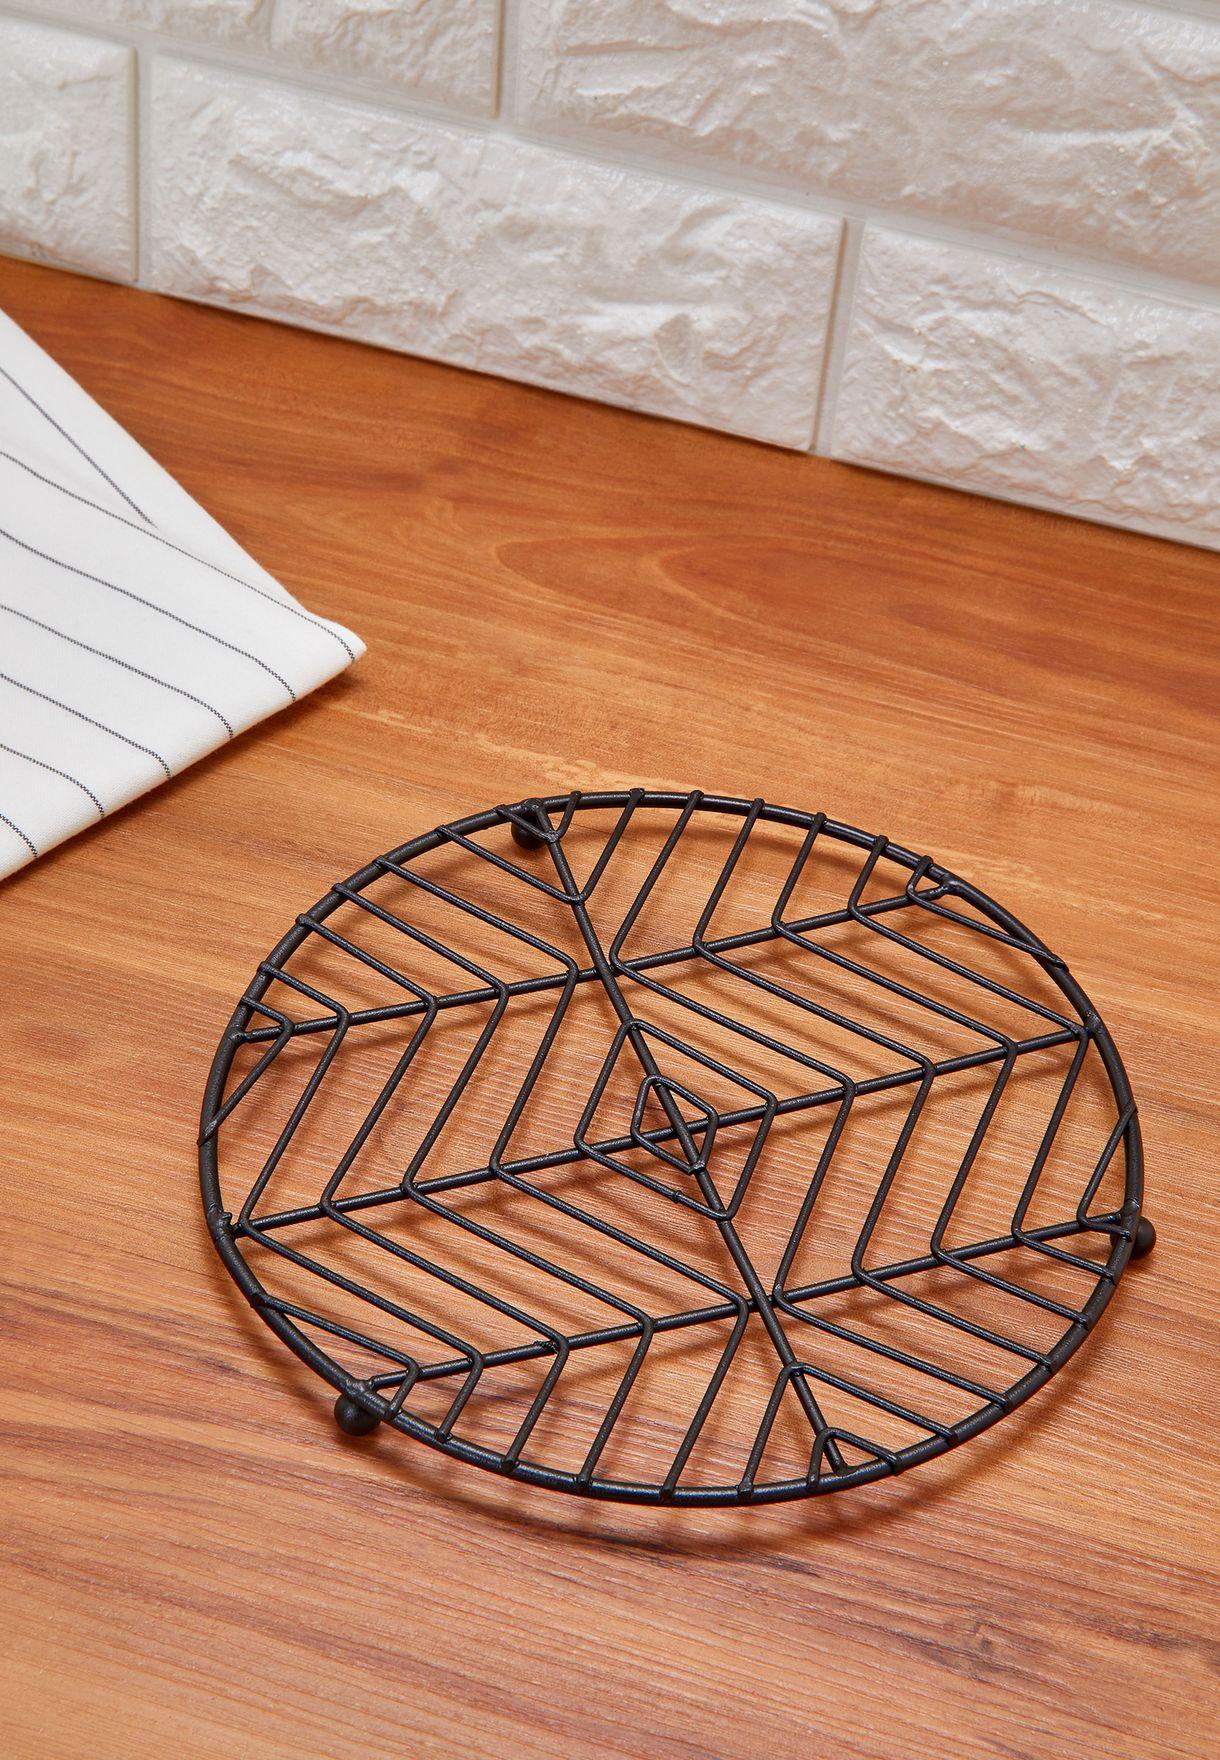 Round Trivet Heat Resistant Mat